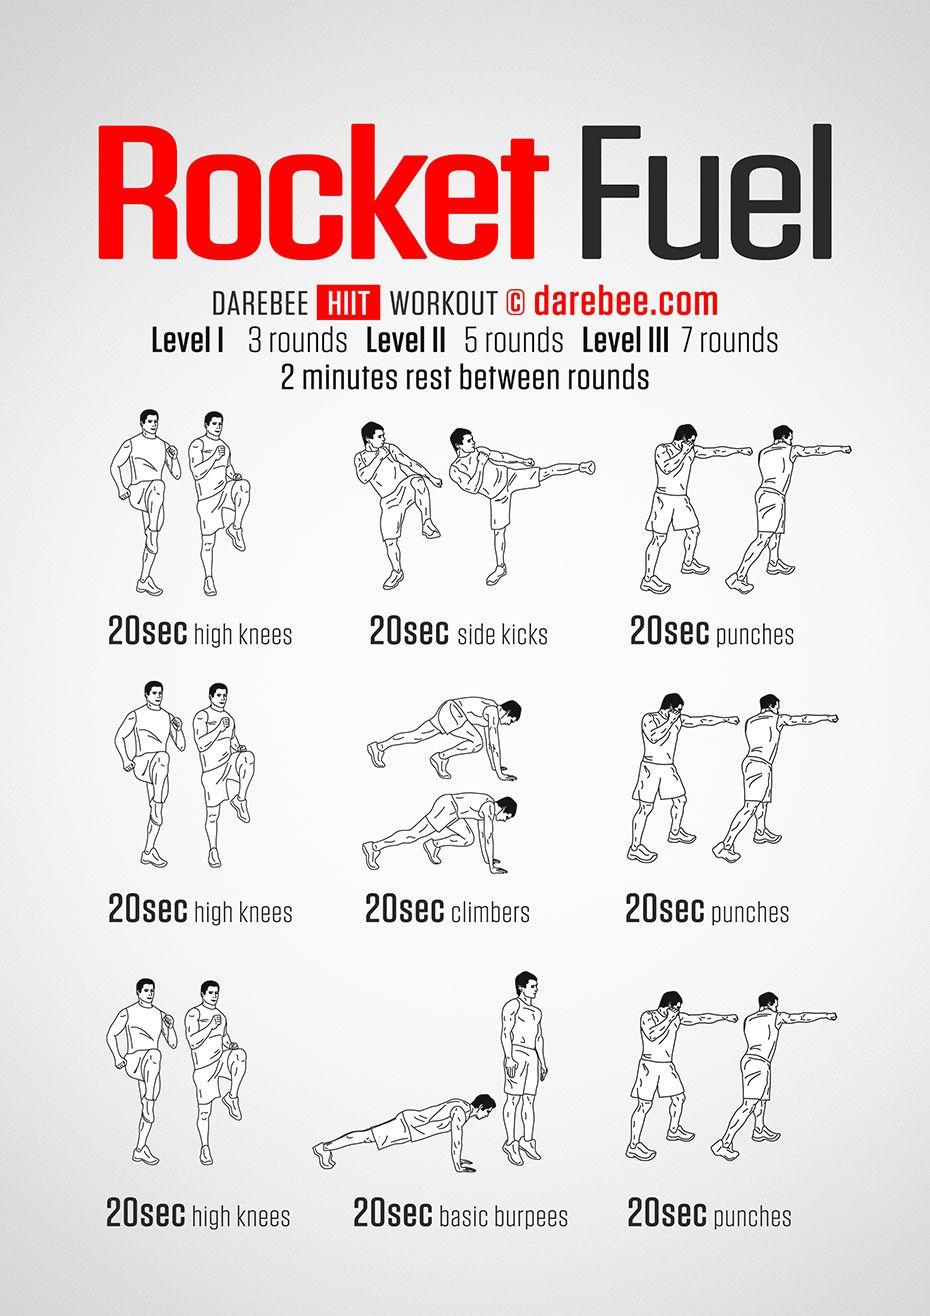 Rocket Fuel Workout Darebee Workout Bodyweight Workout